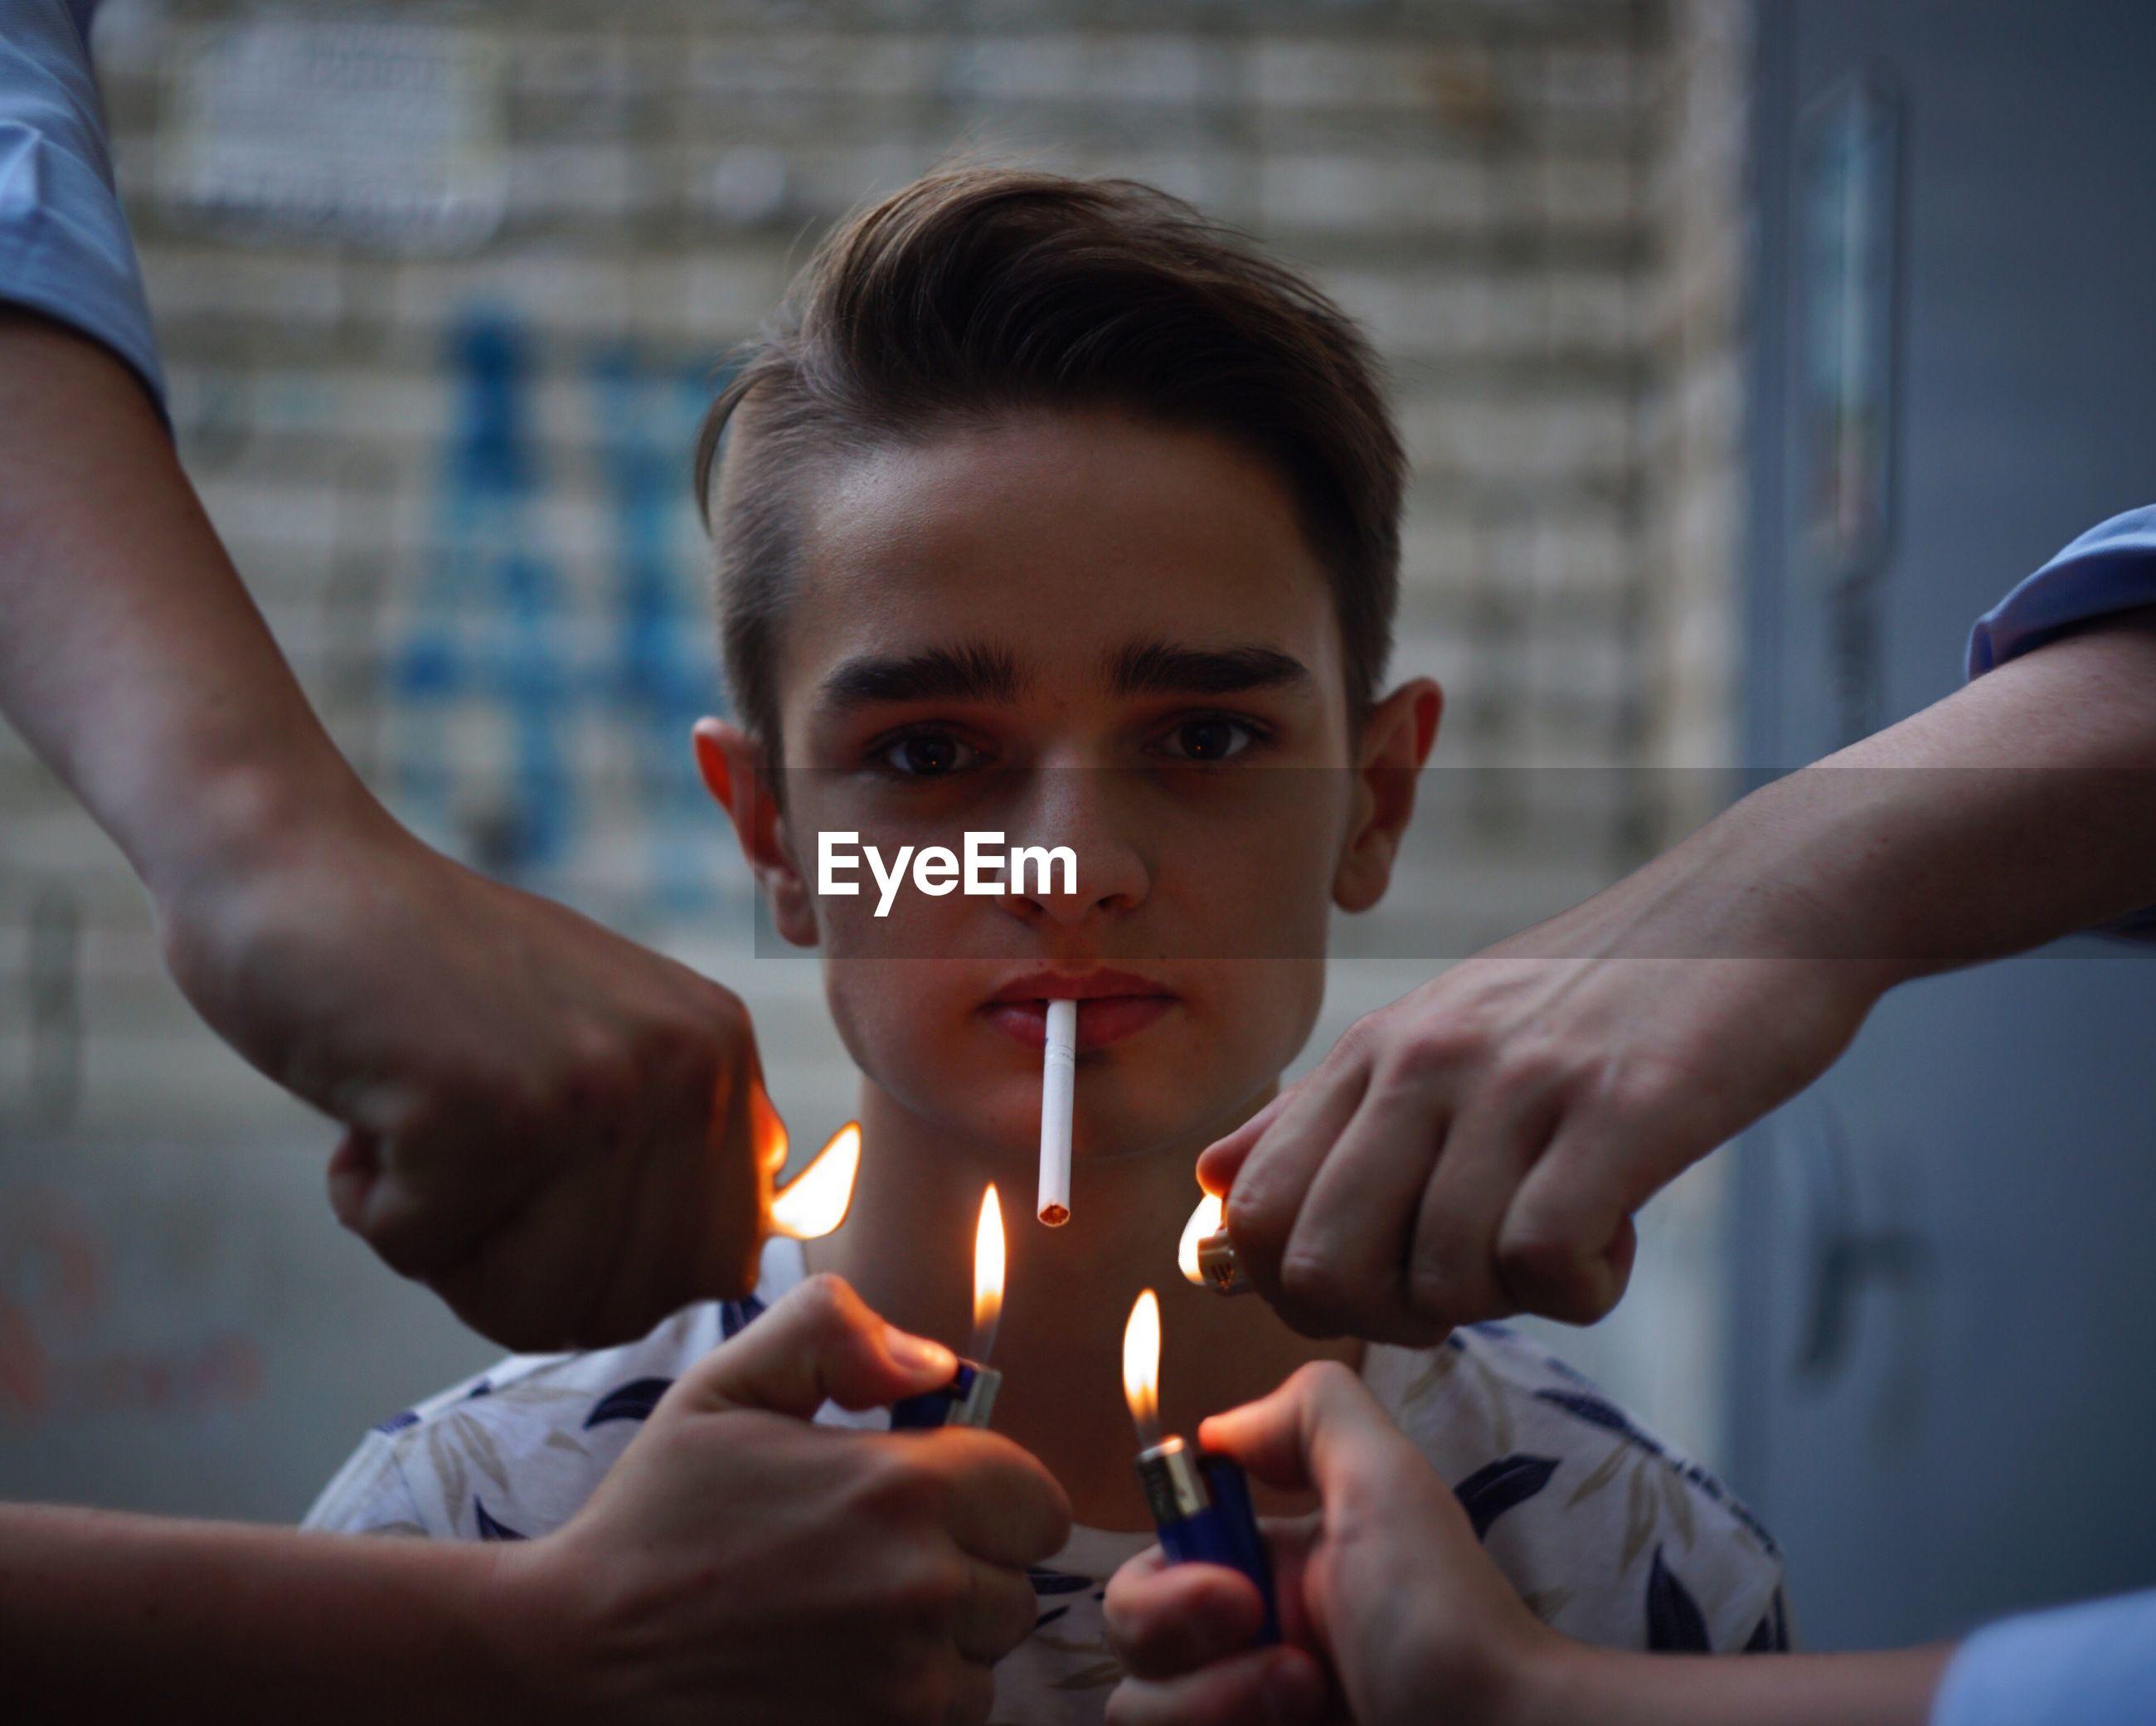 Hands igniting cigarette of teenage boy